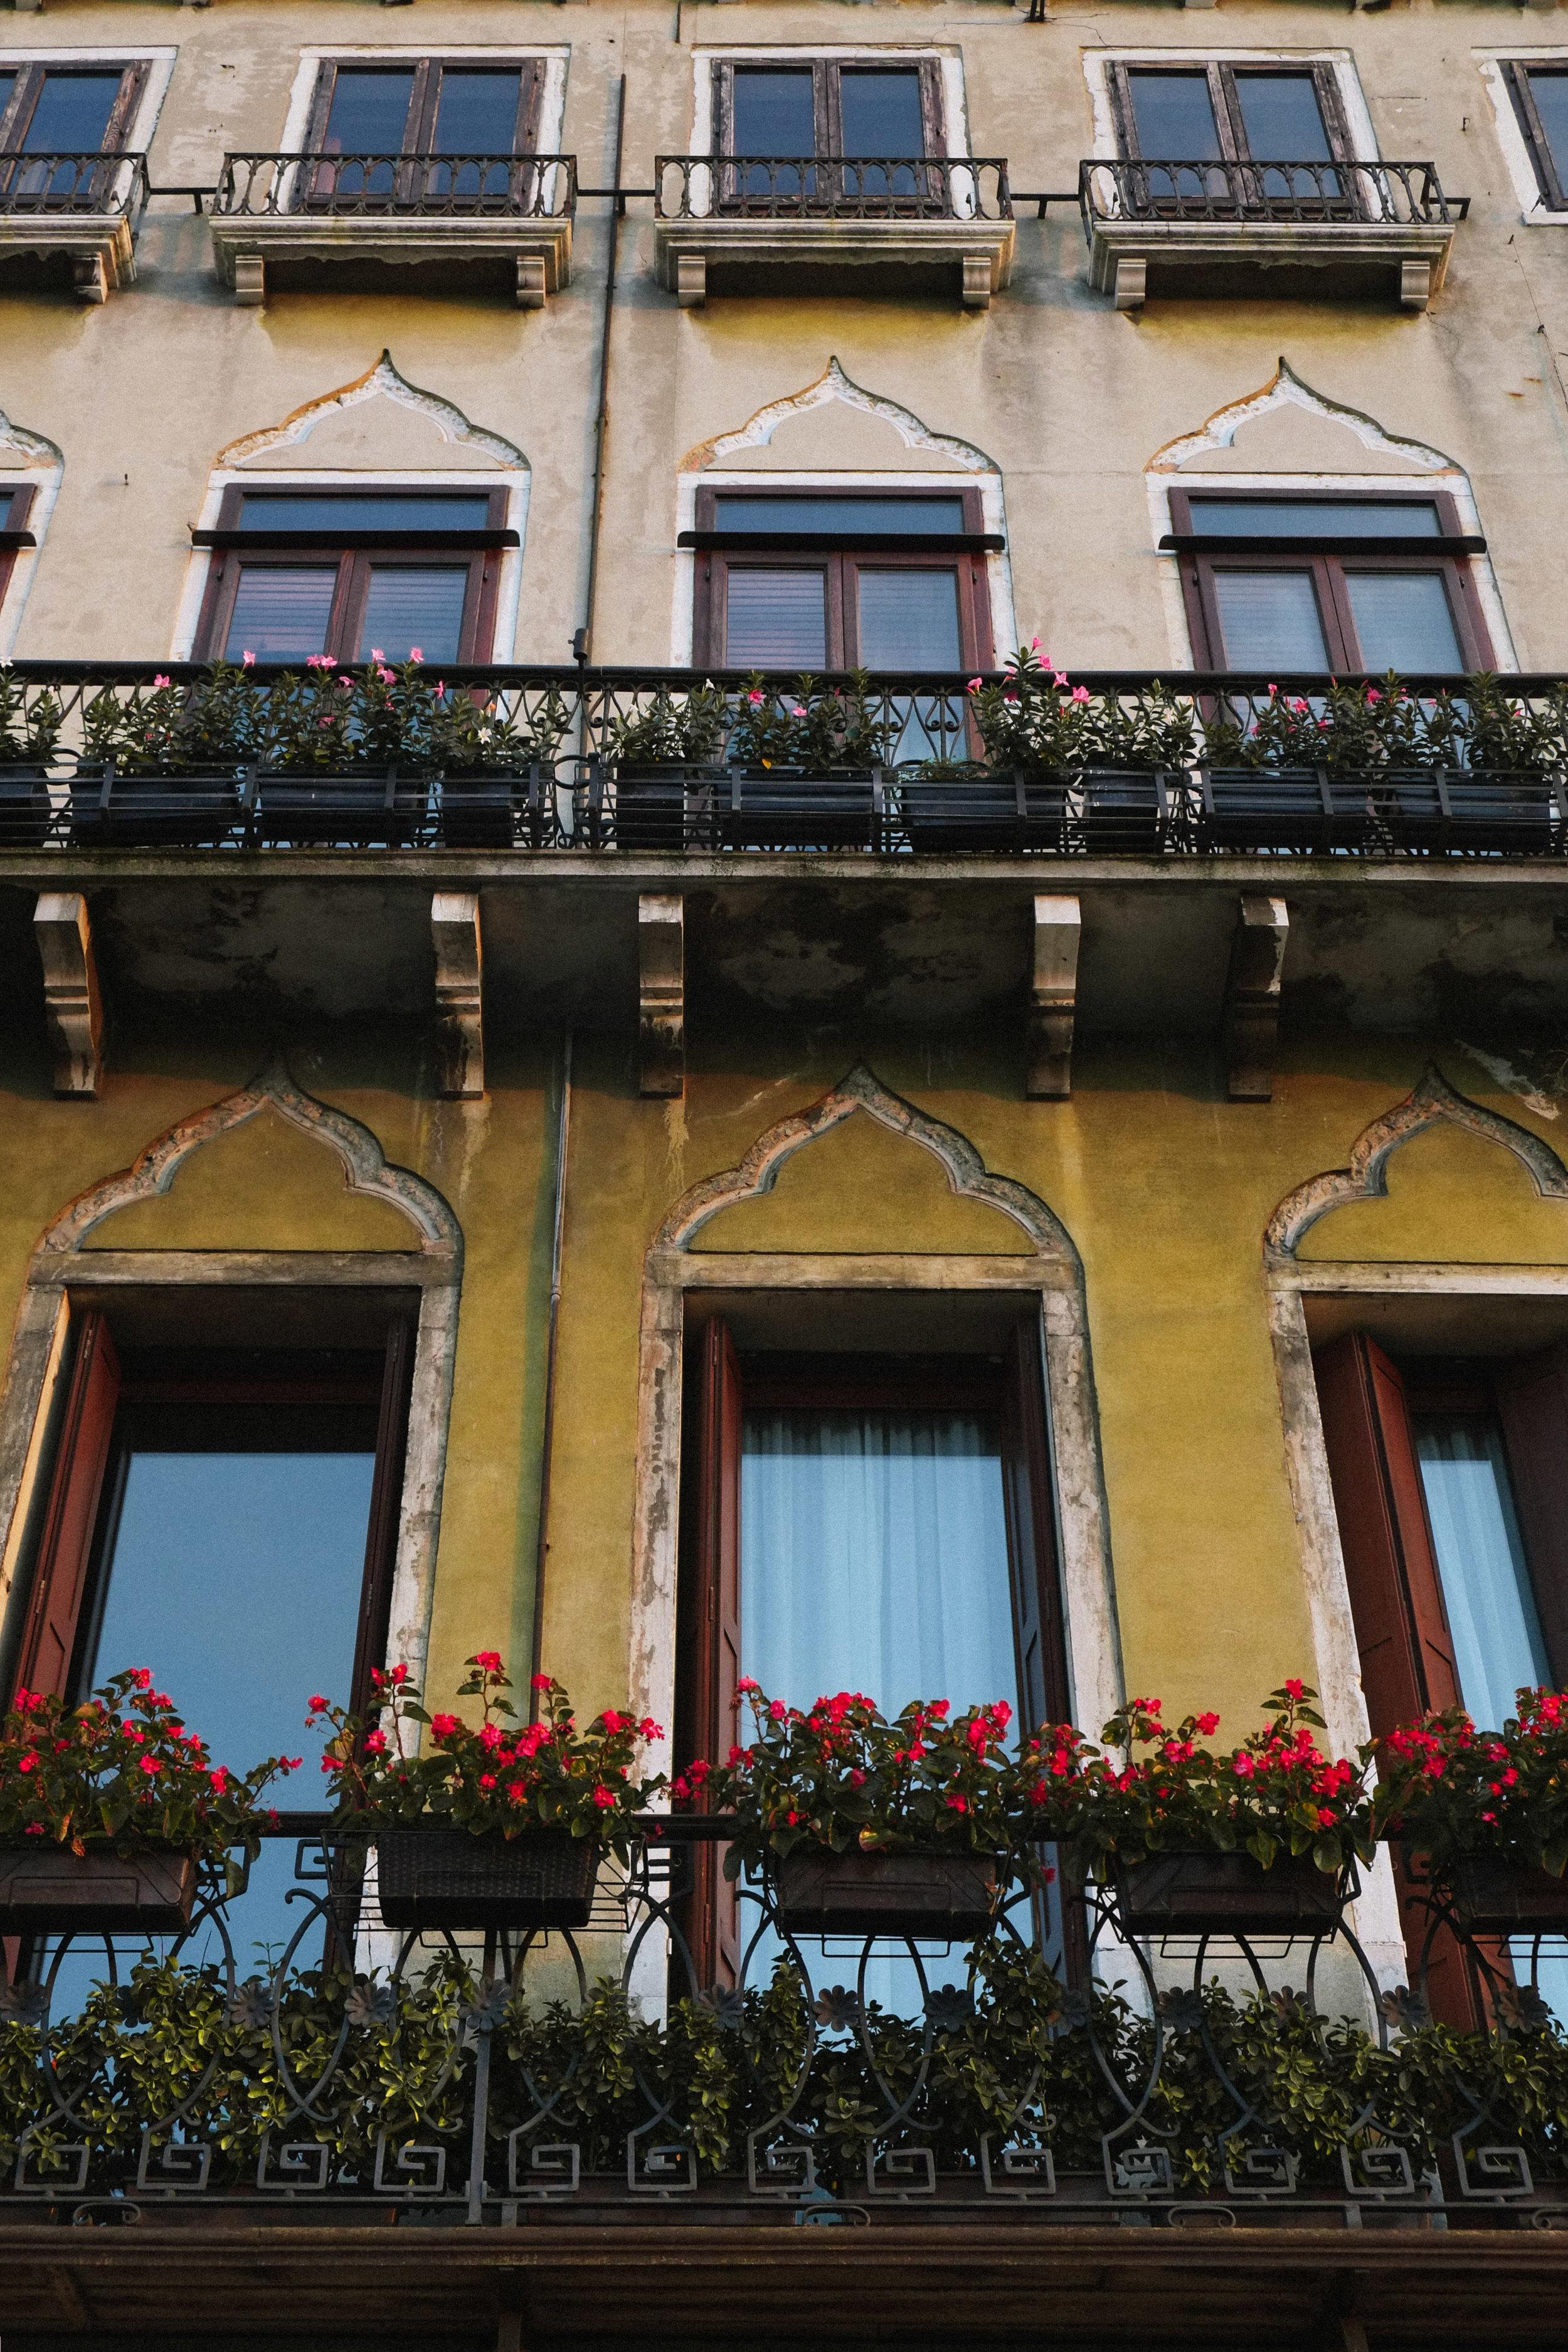 Lesly Lotha_Venice_Italy 06.jpg